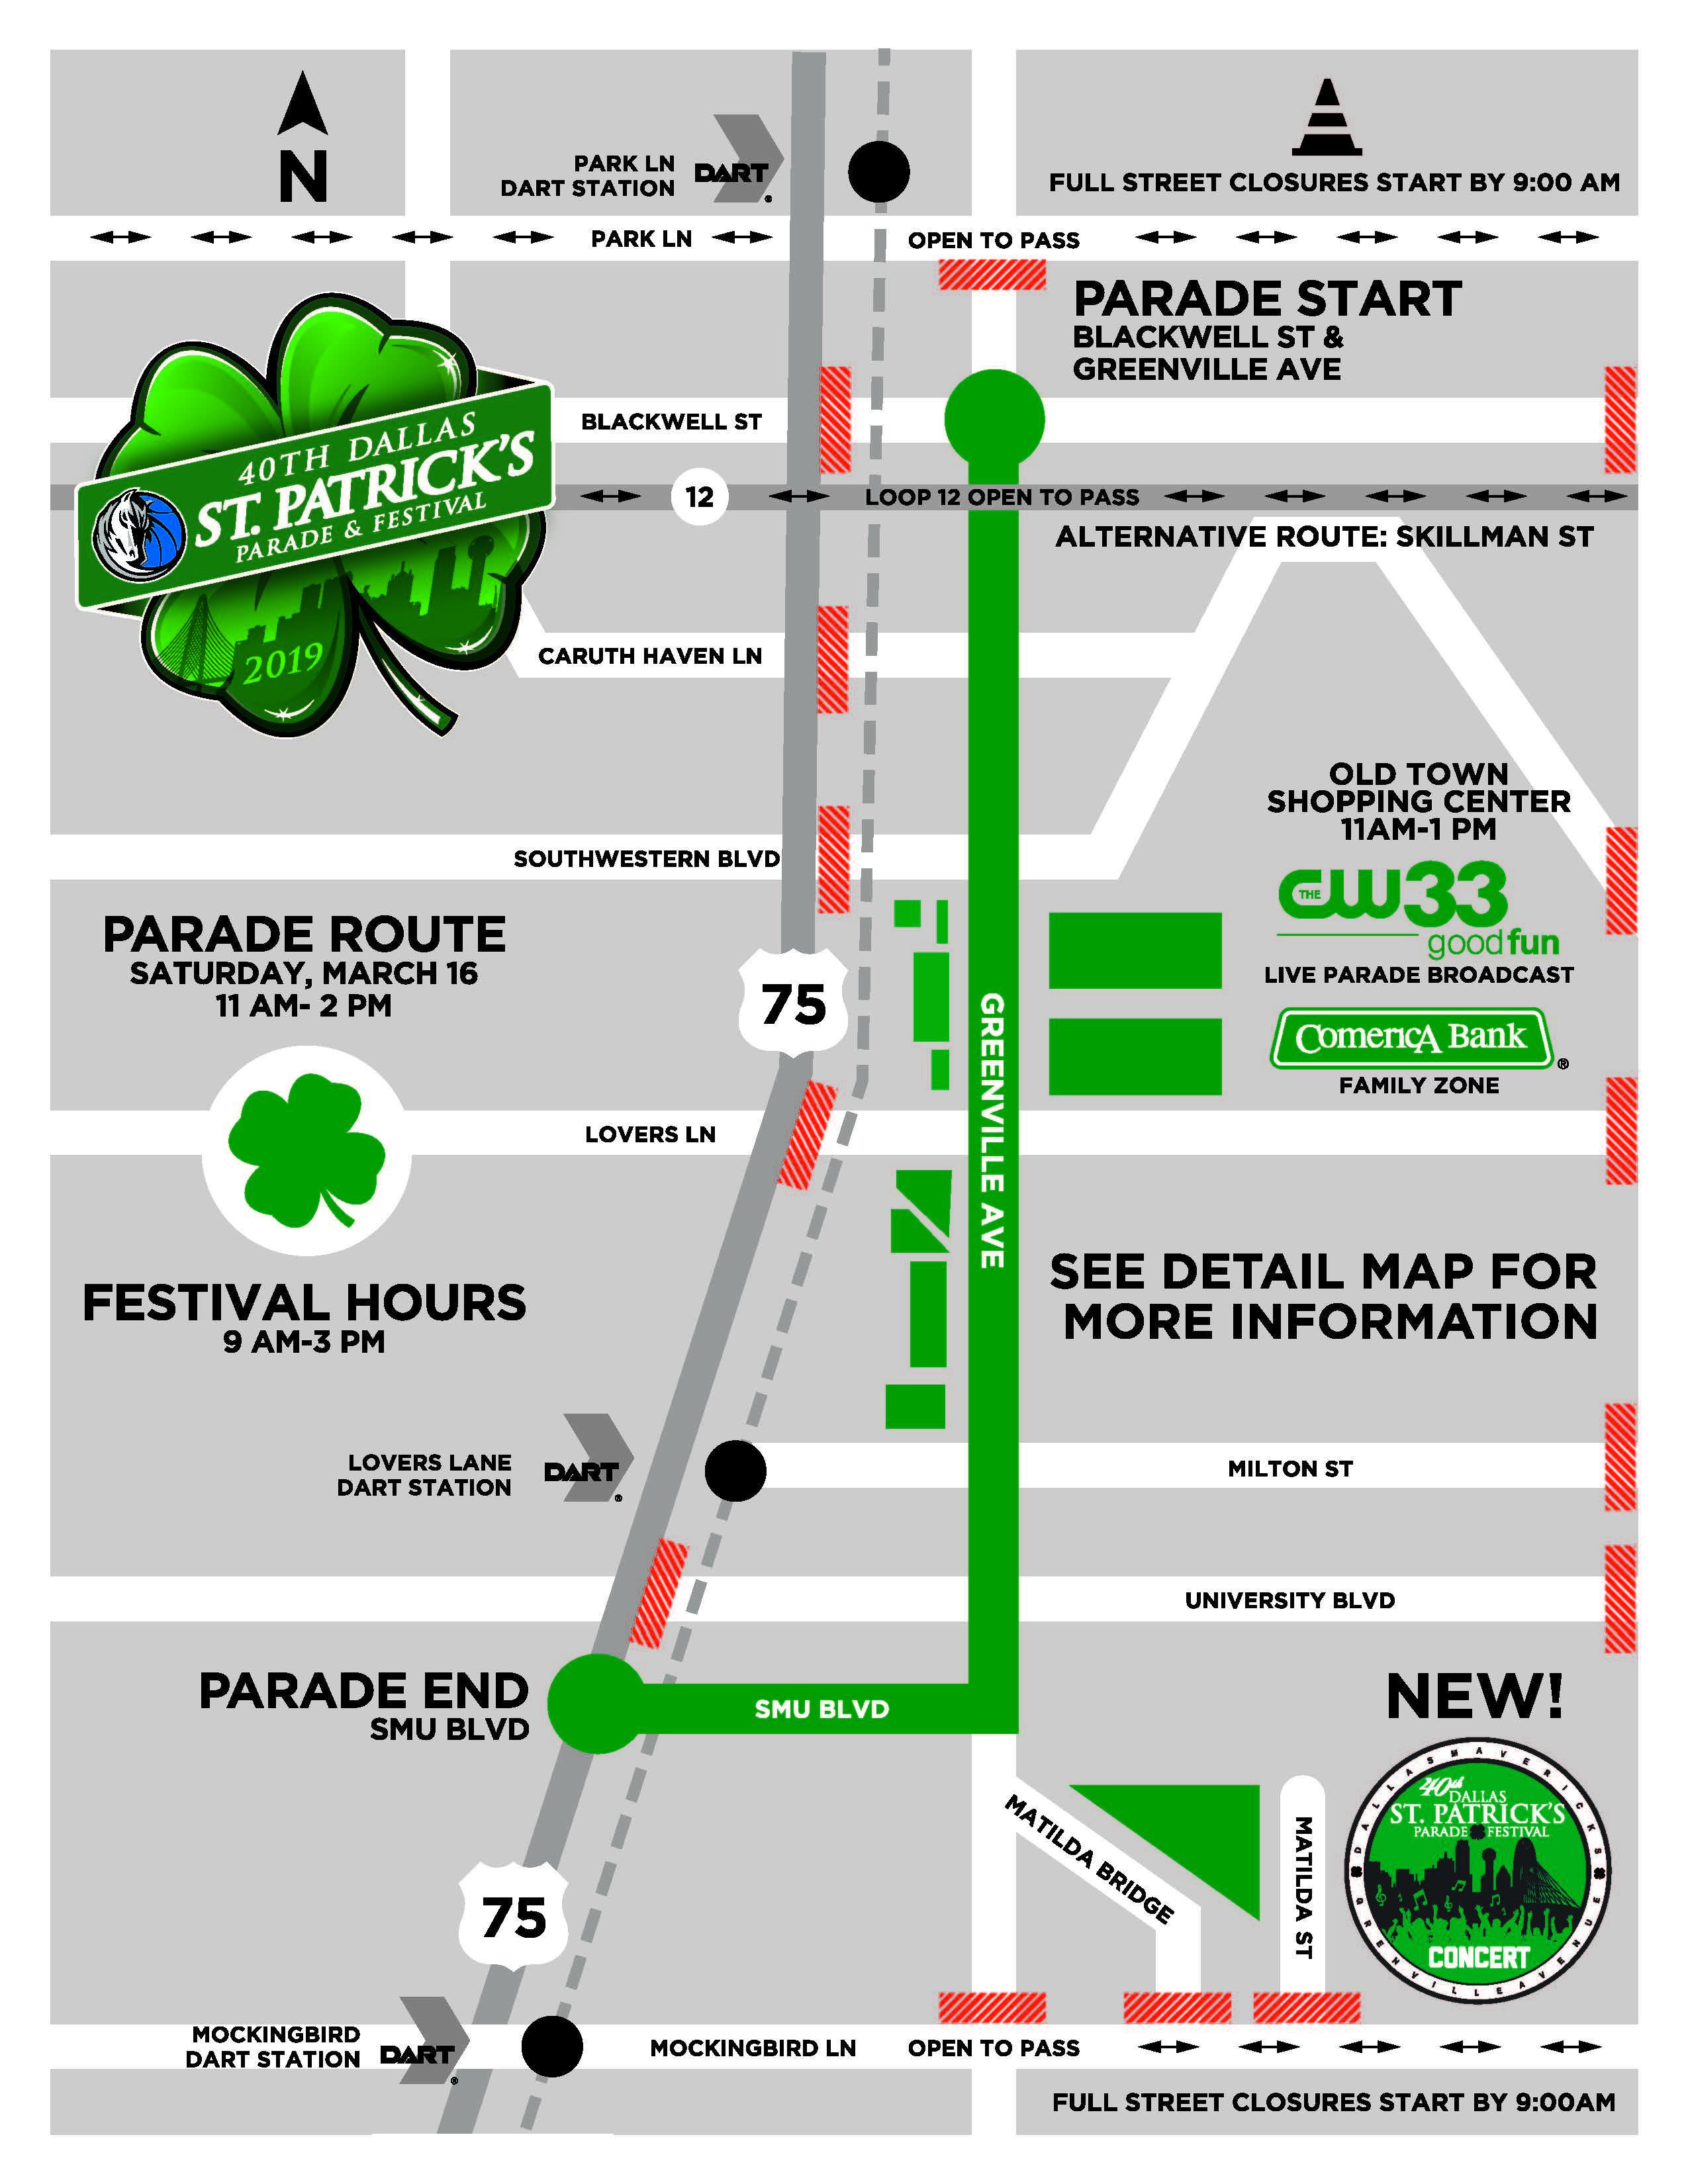 Annual St. Patrick's Day Parade in Manhattan celebrates Irish heritage